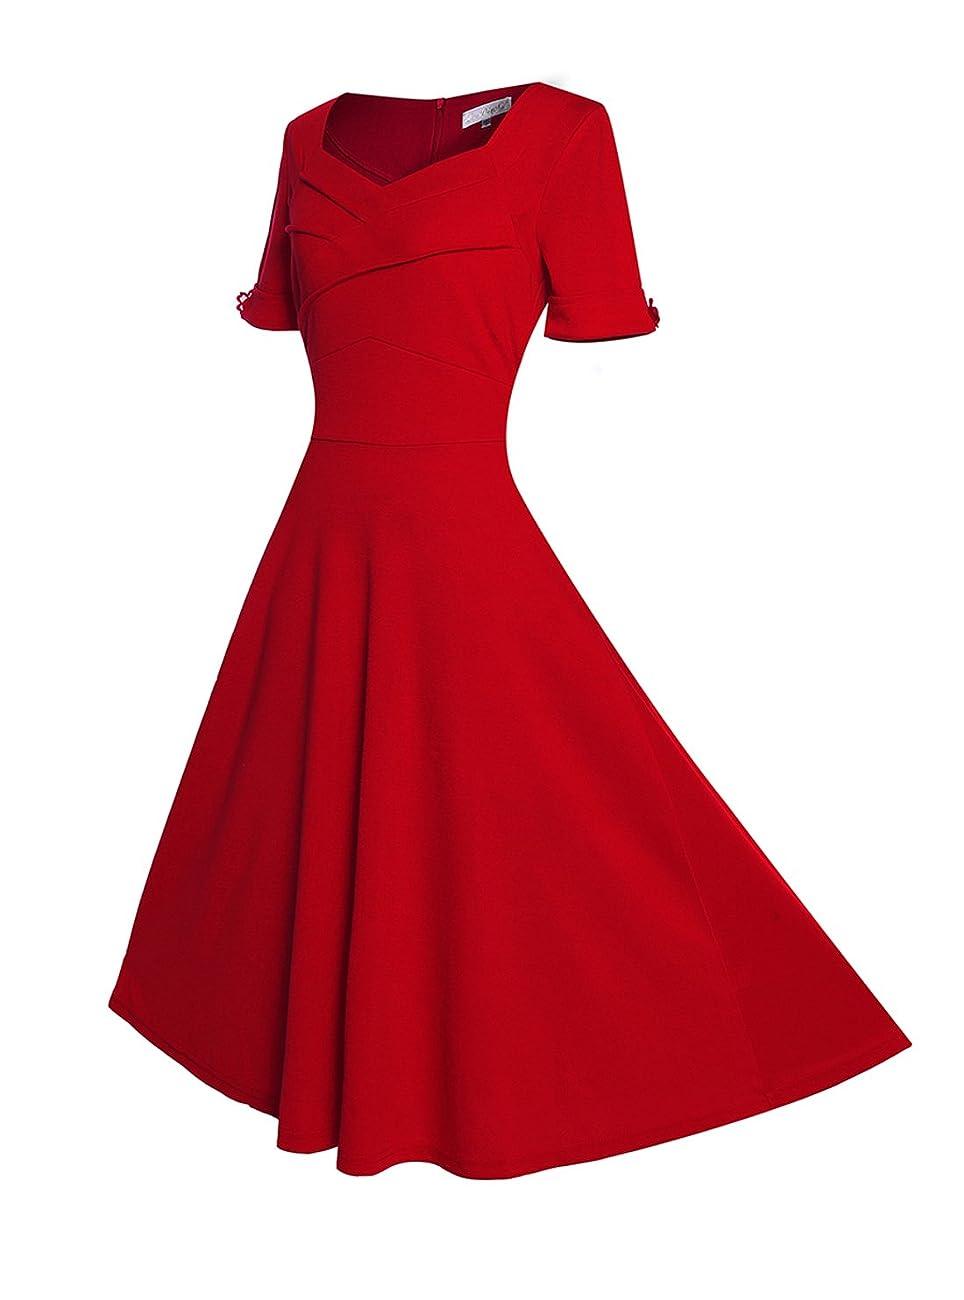 Relipop Women's Vintage V-neck Half Sleeve Dress Casual A-line Dresses 2